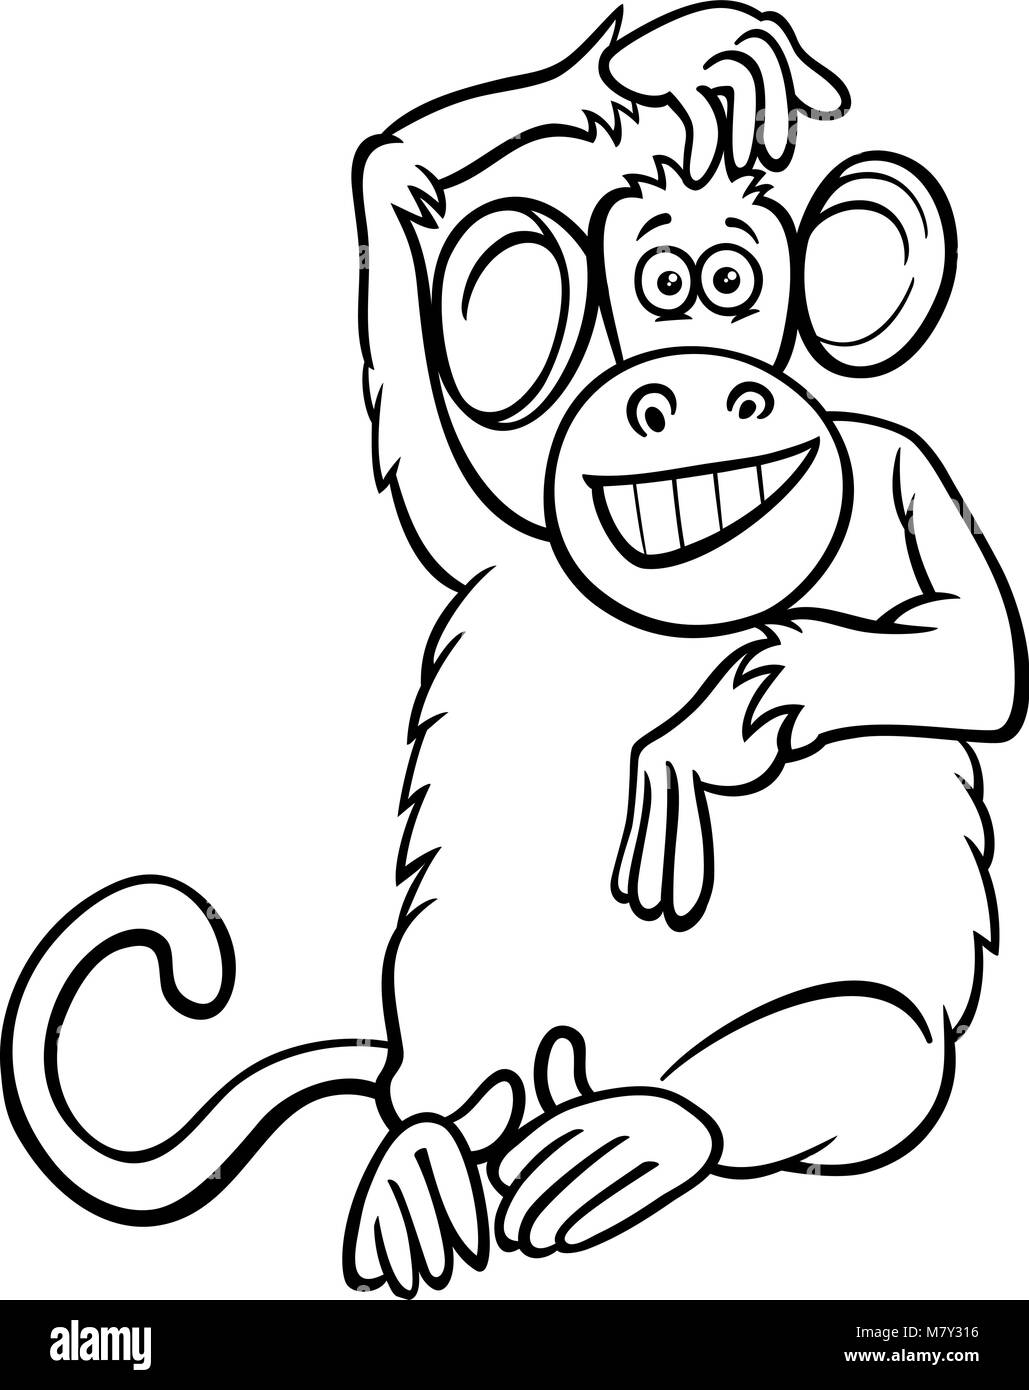 Funny Monkey Drawing : funny, monkey, drawing, Black, White, Cartoon, Illustration, Funny, Monkey, Primate, Animal, Stock, Vector, Image, Alamy